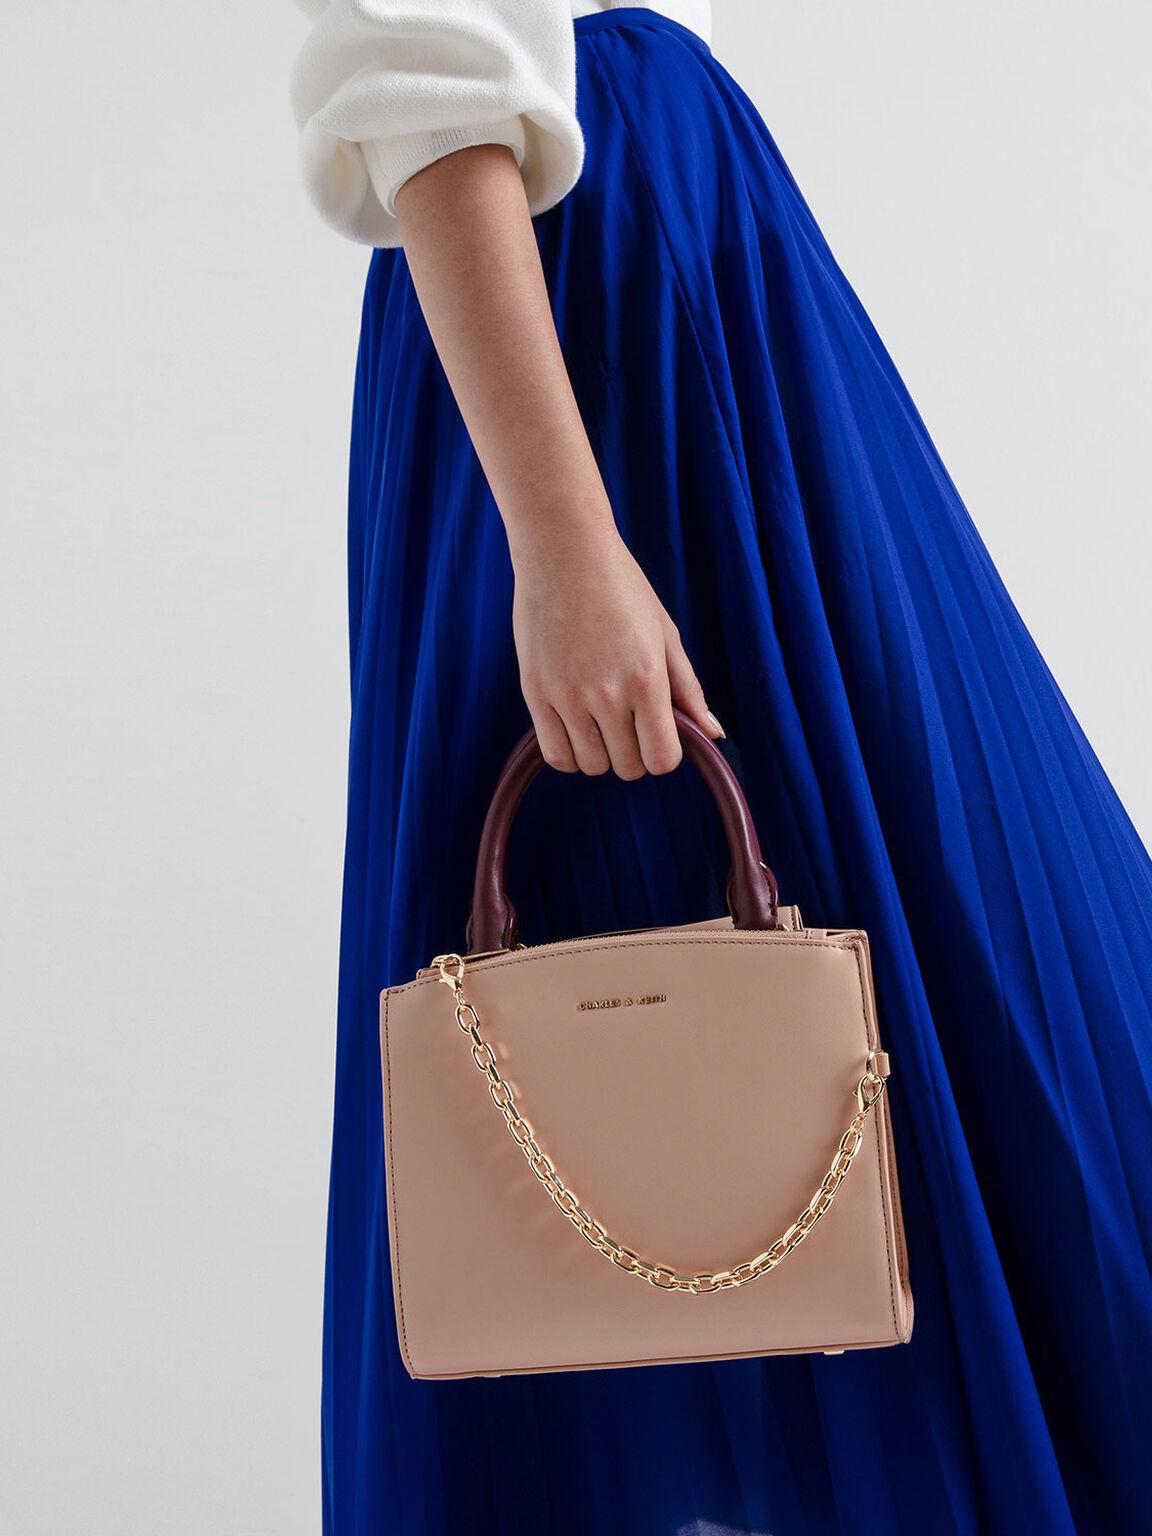 Chain Link Classic Handbag, Multi, hi-res